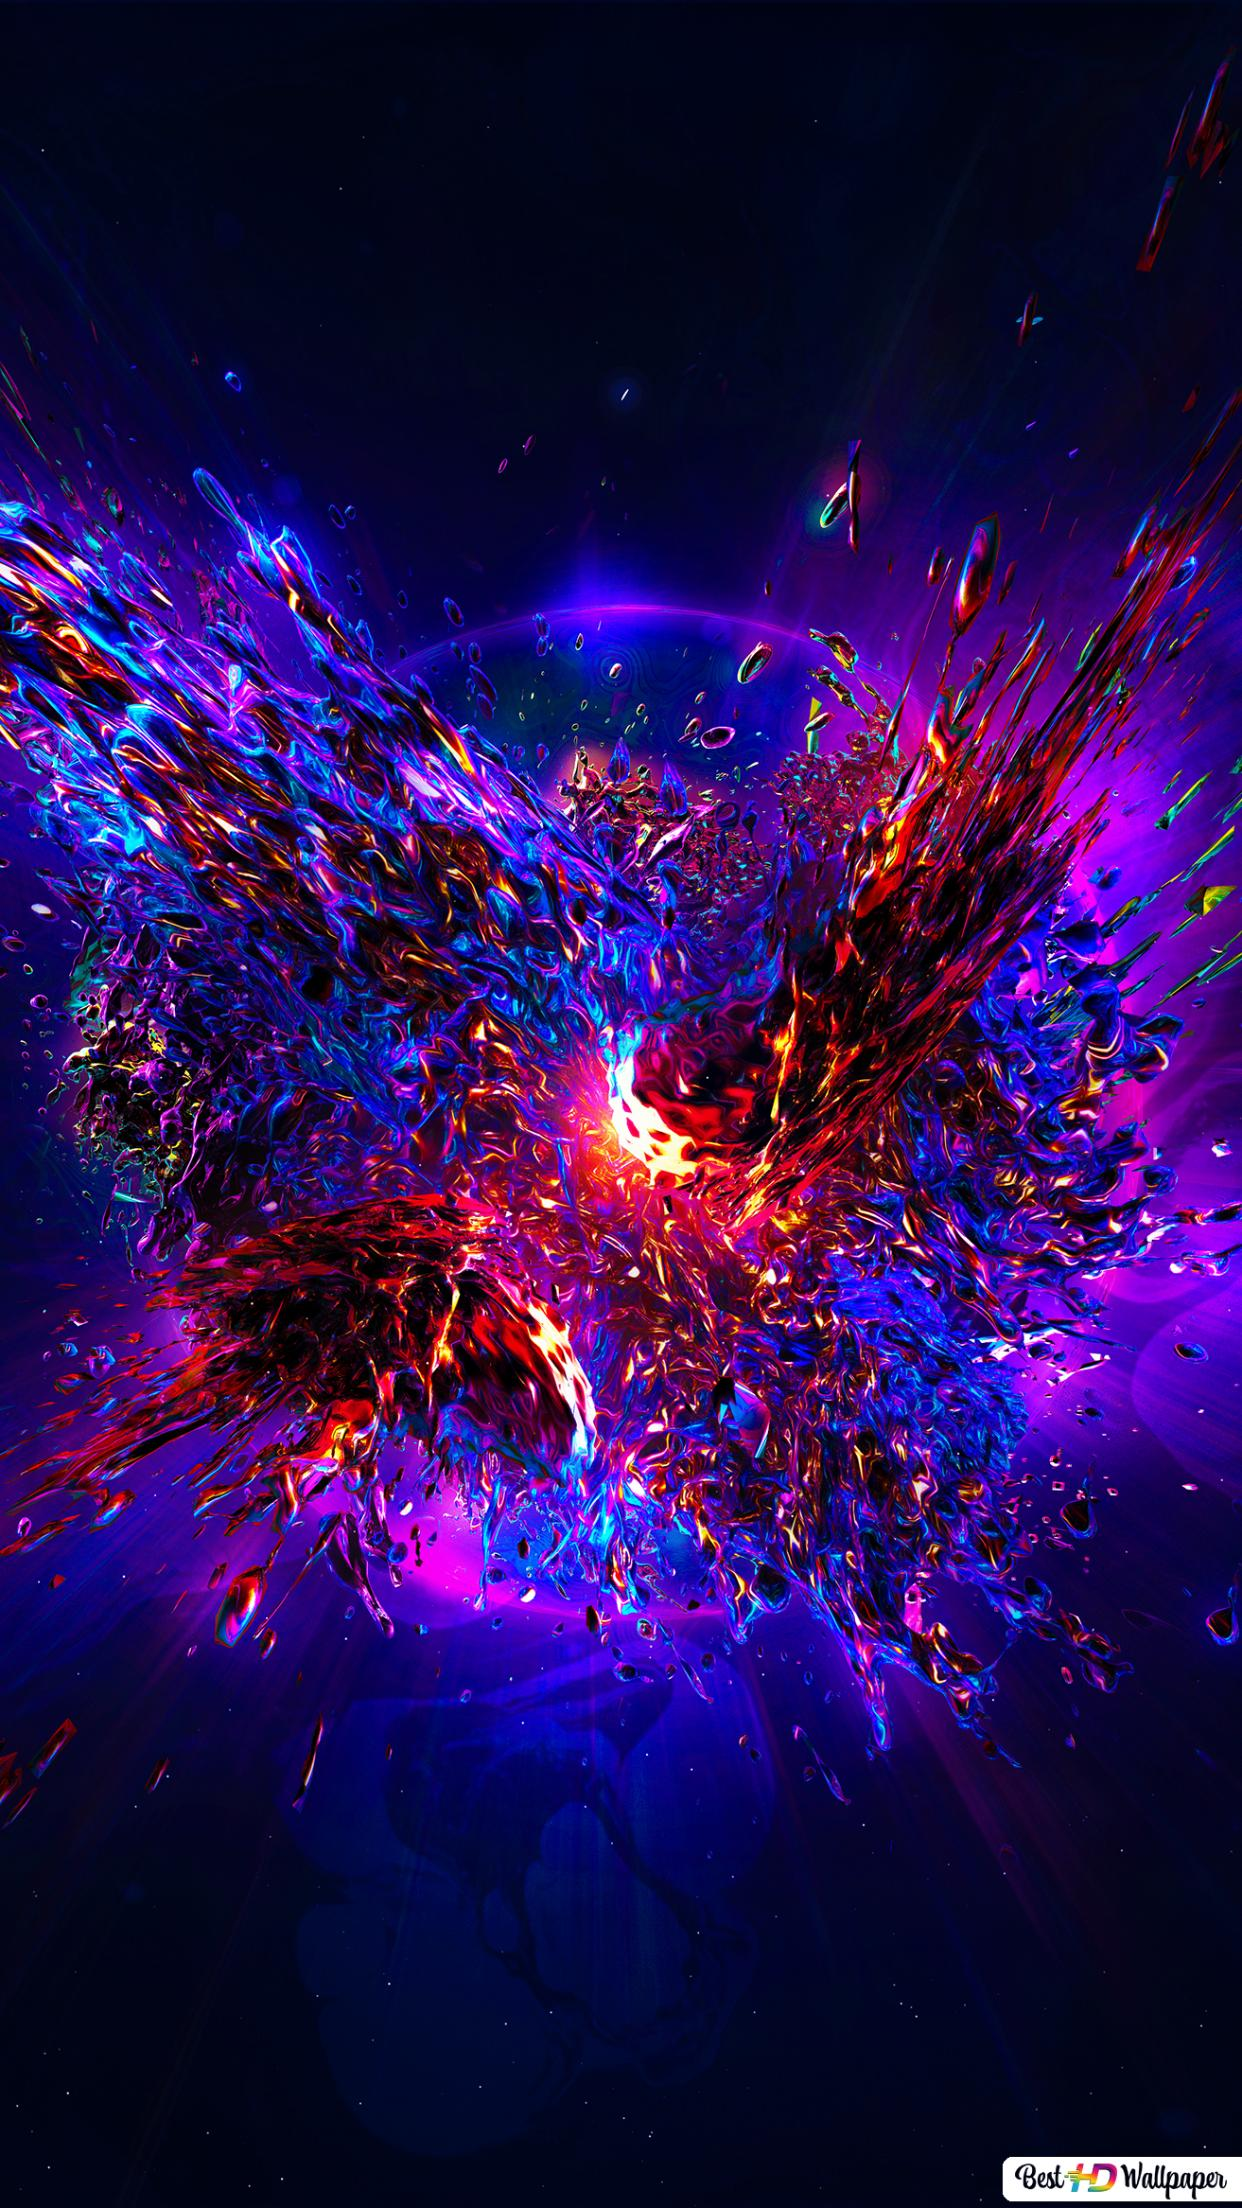 3d explosion splash wallpaper 1242x2208 16886 167